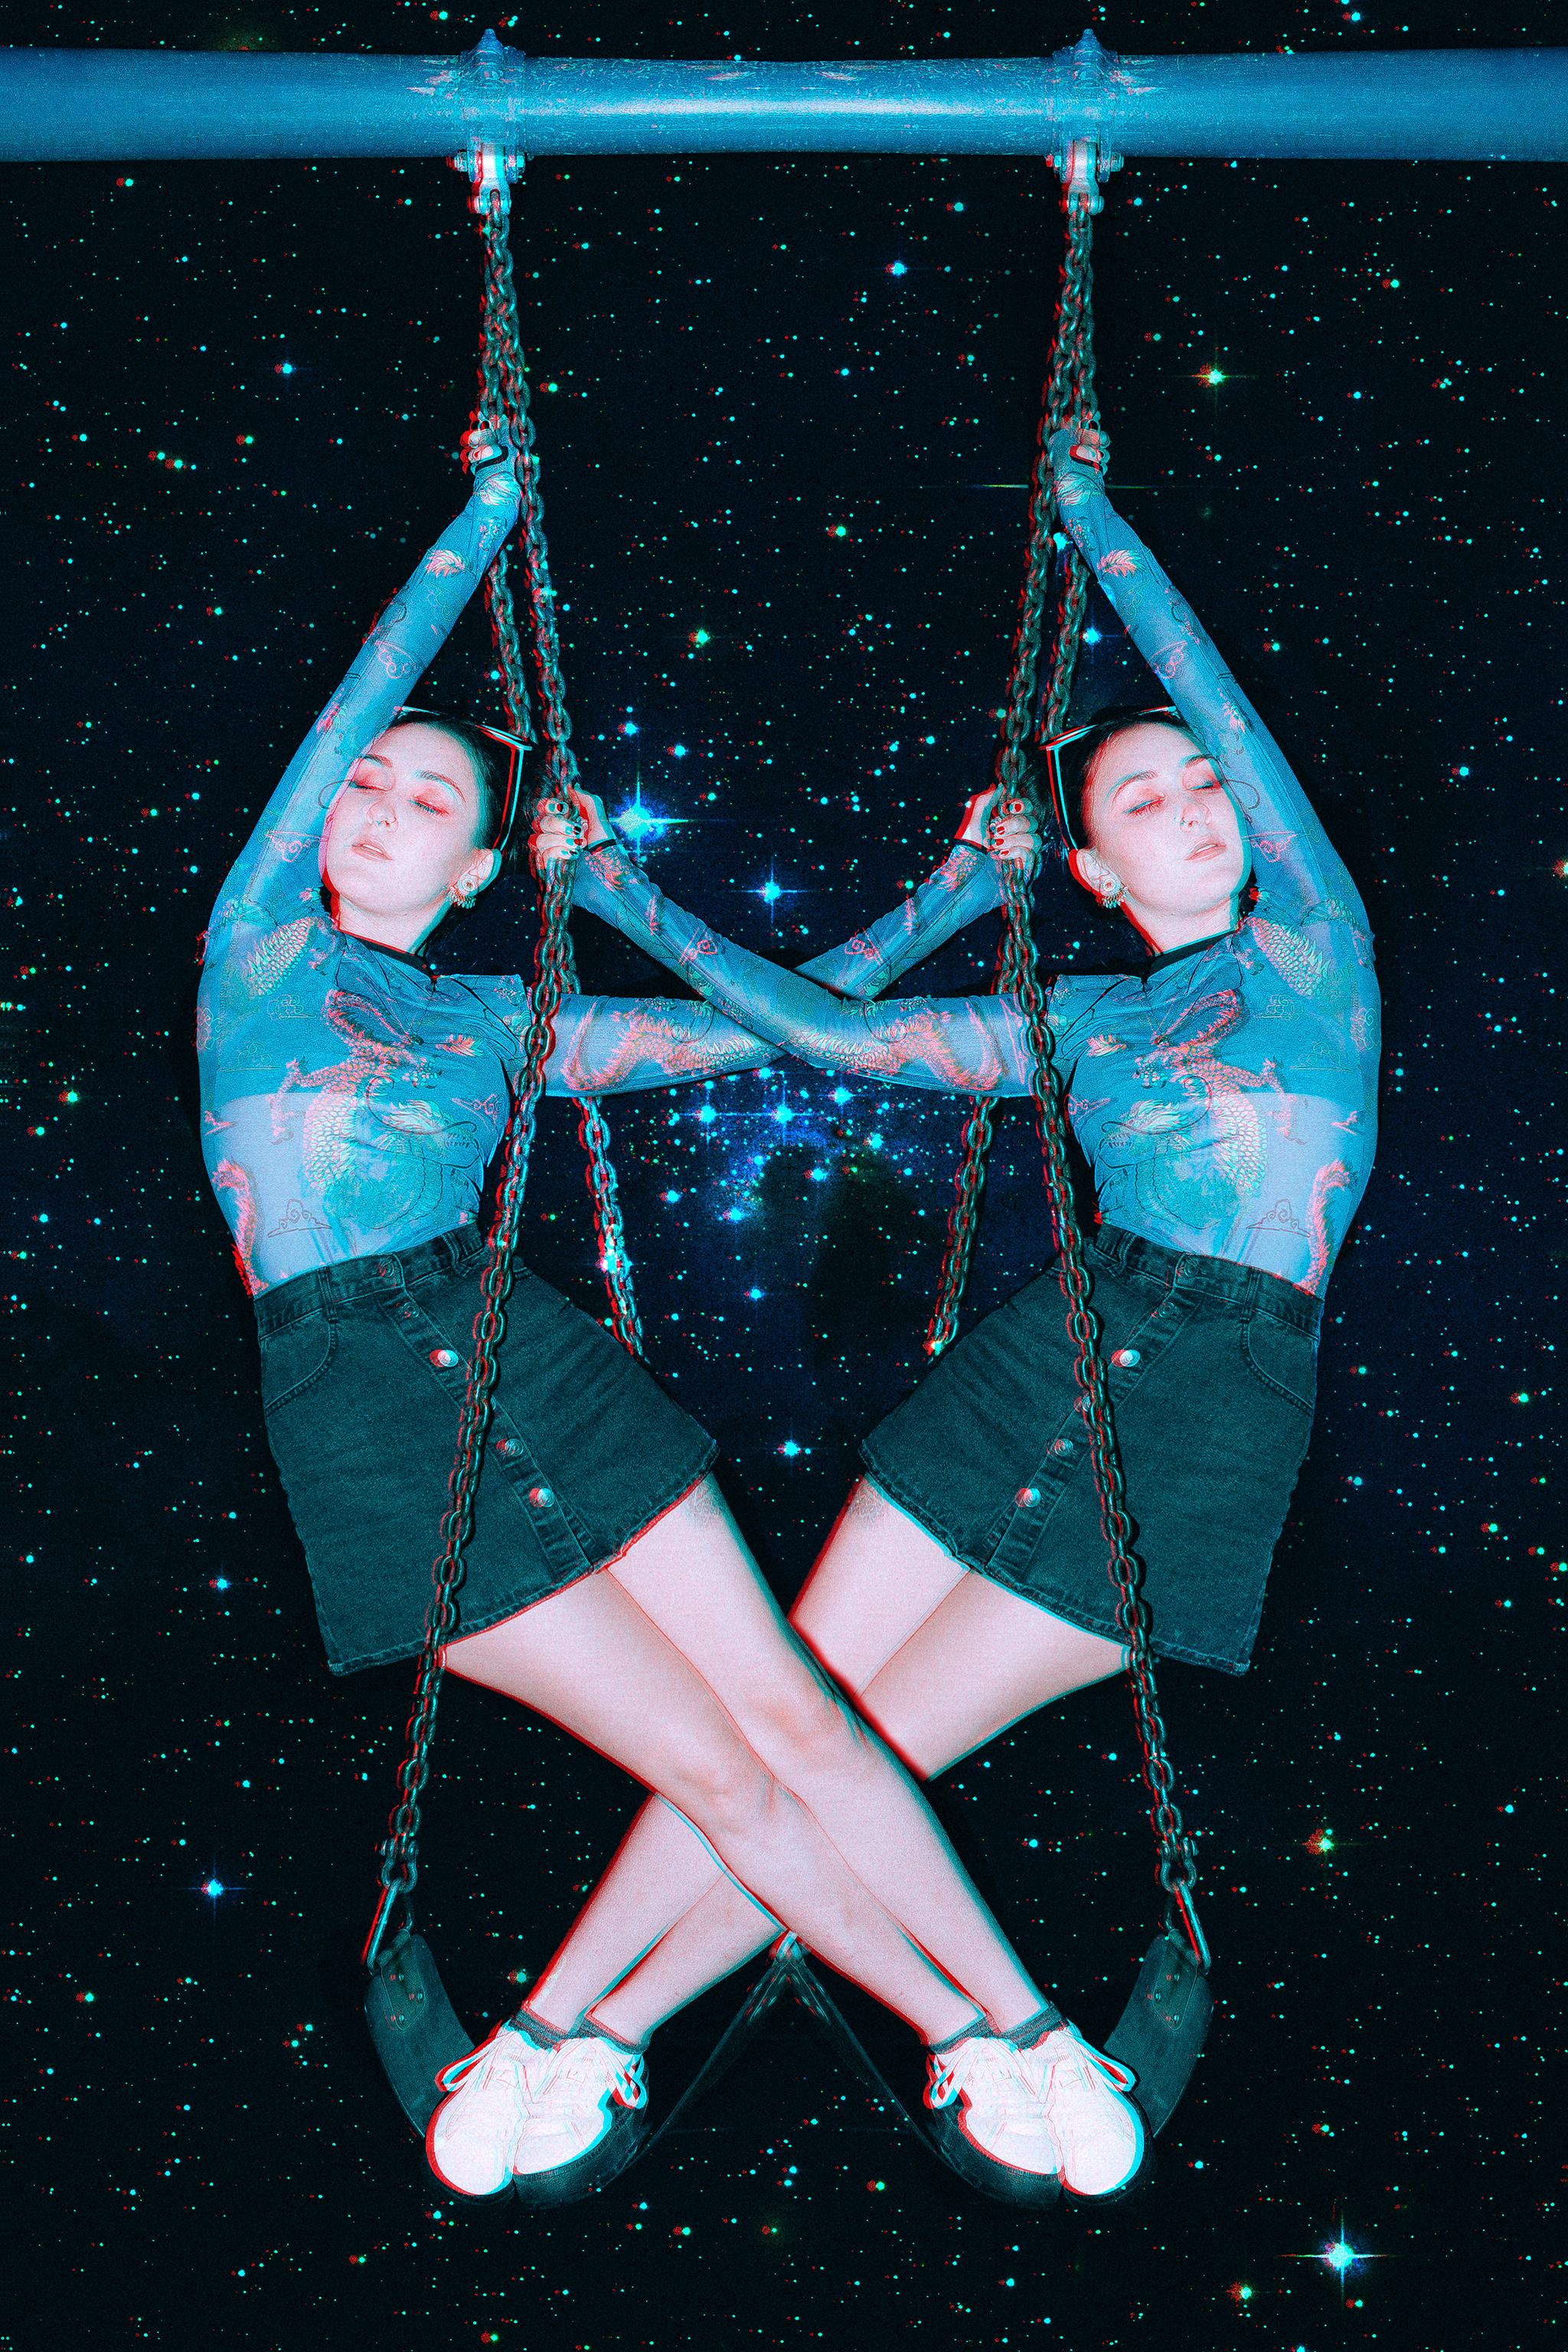 swinging3d